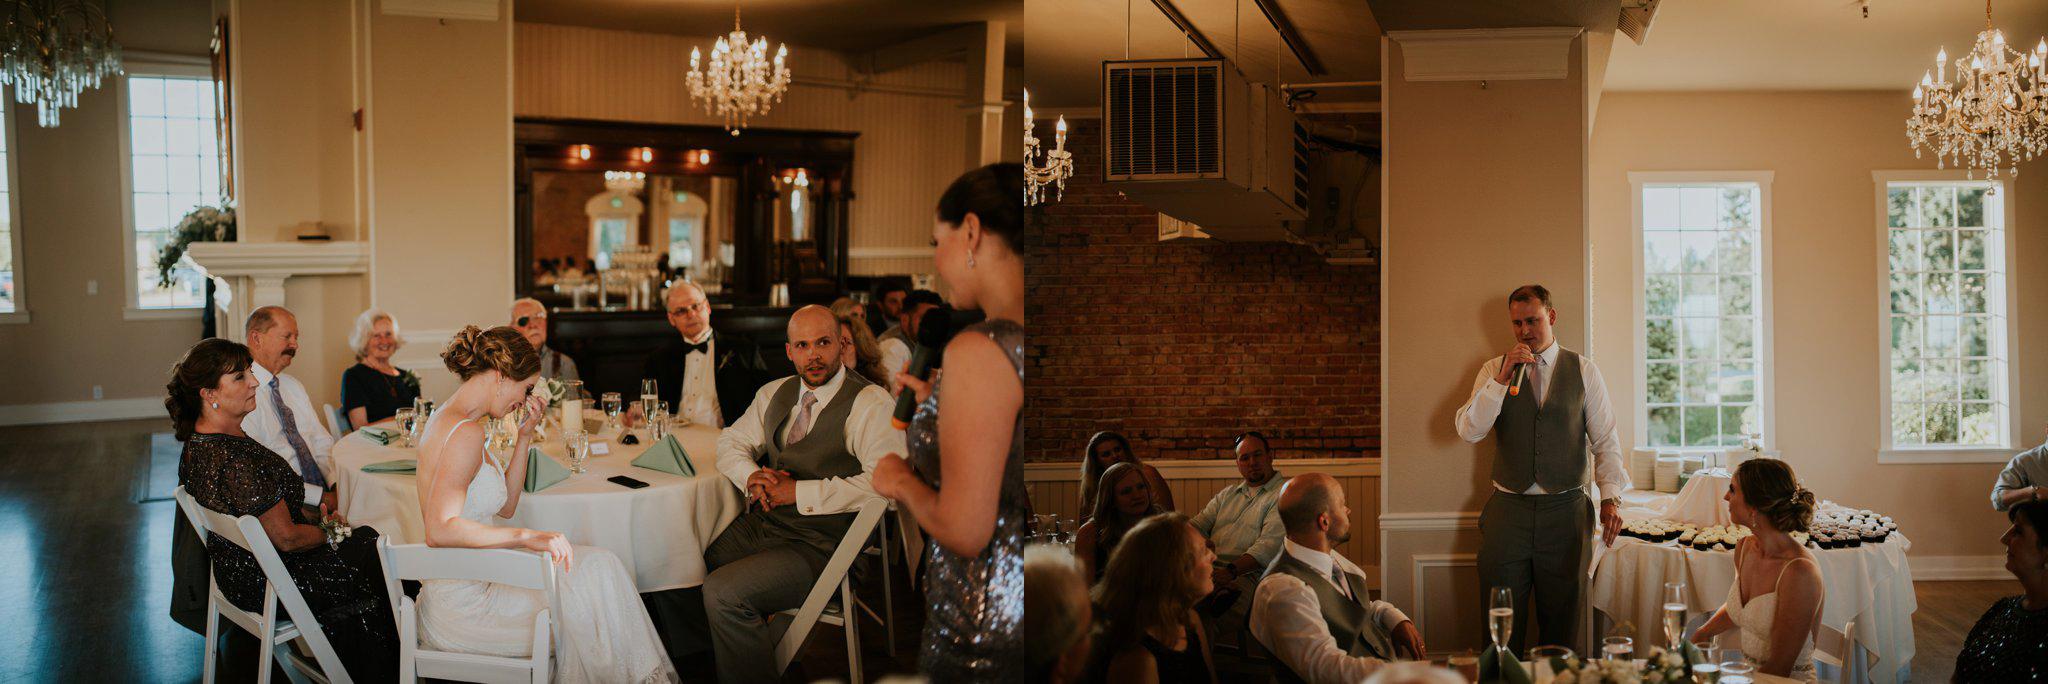 hollywood-school-house-wedding-seattle-photographer-caitlyn-nikula-102.jpg